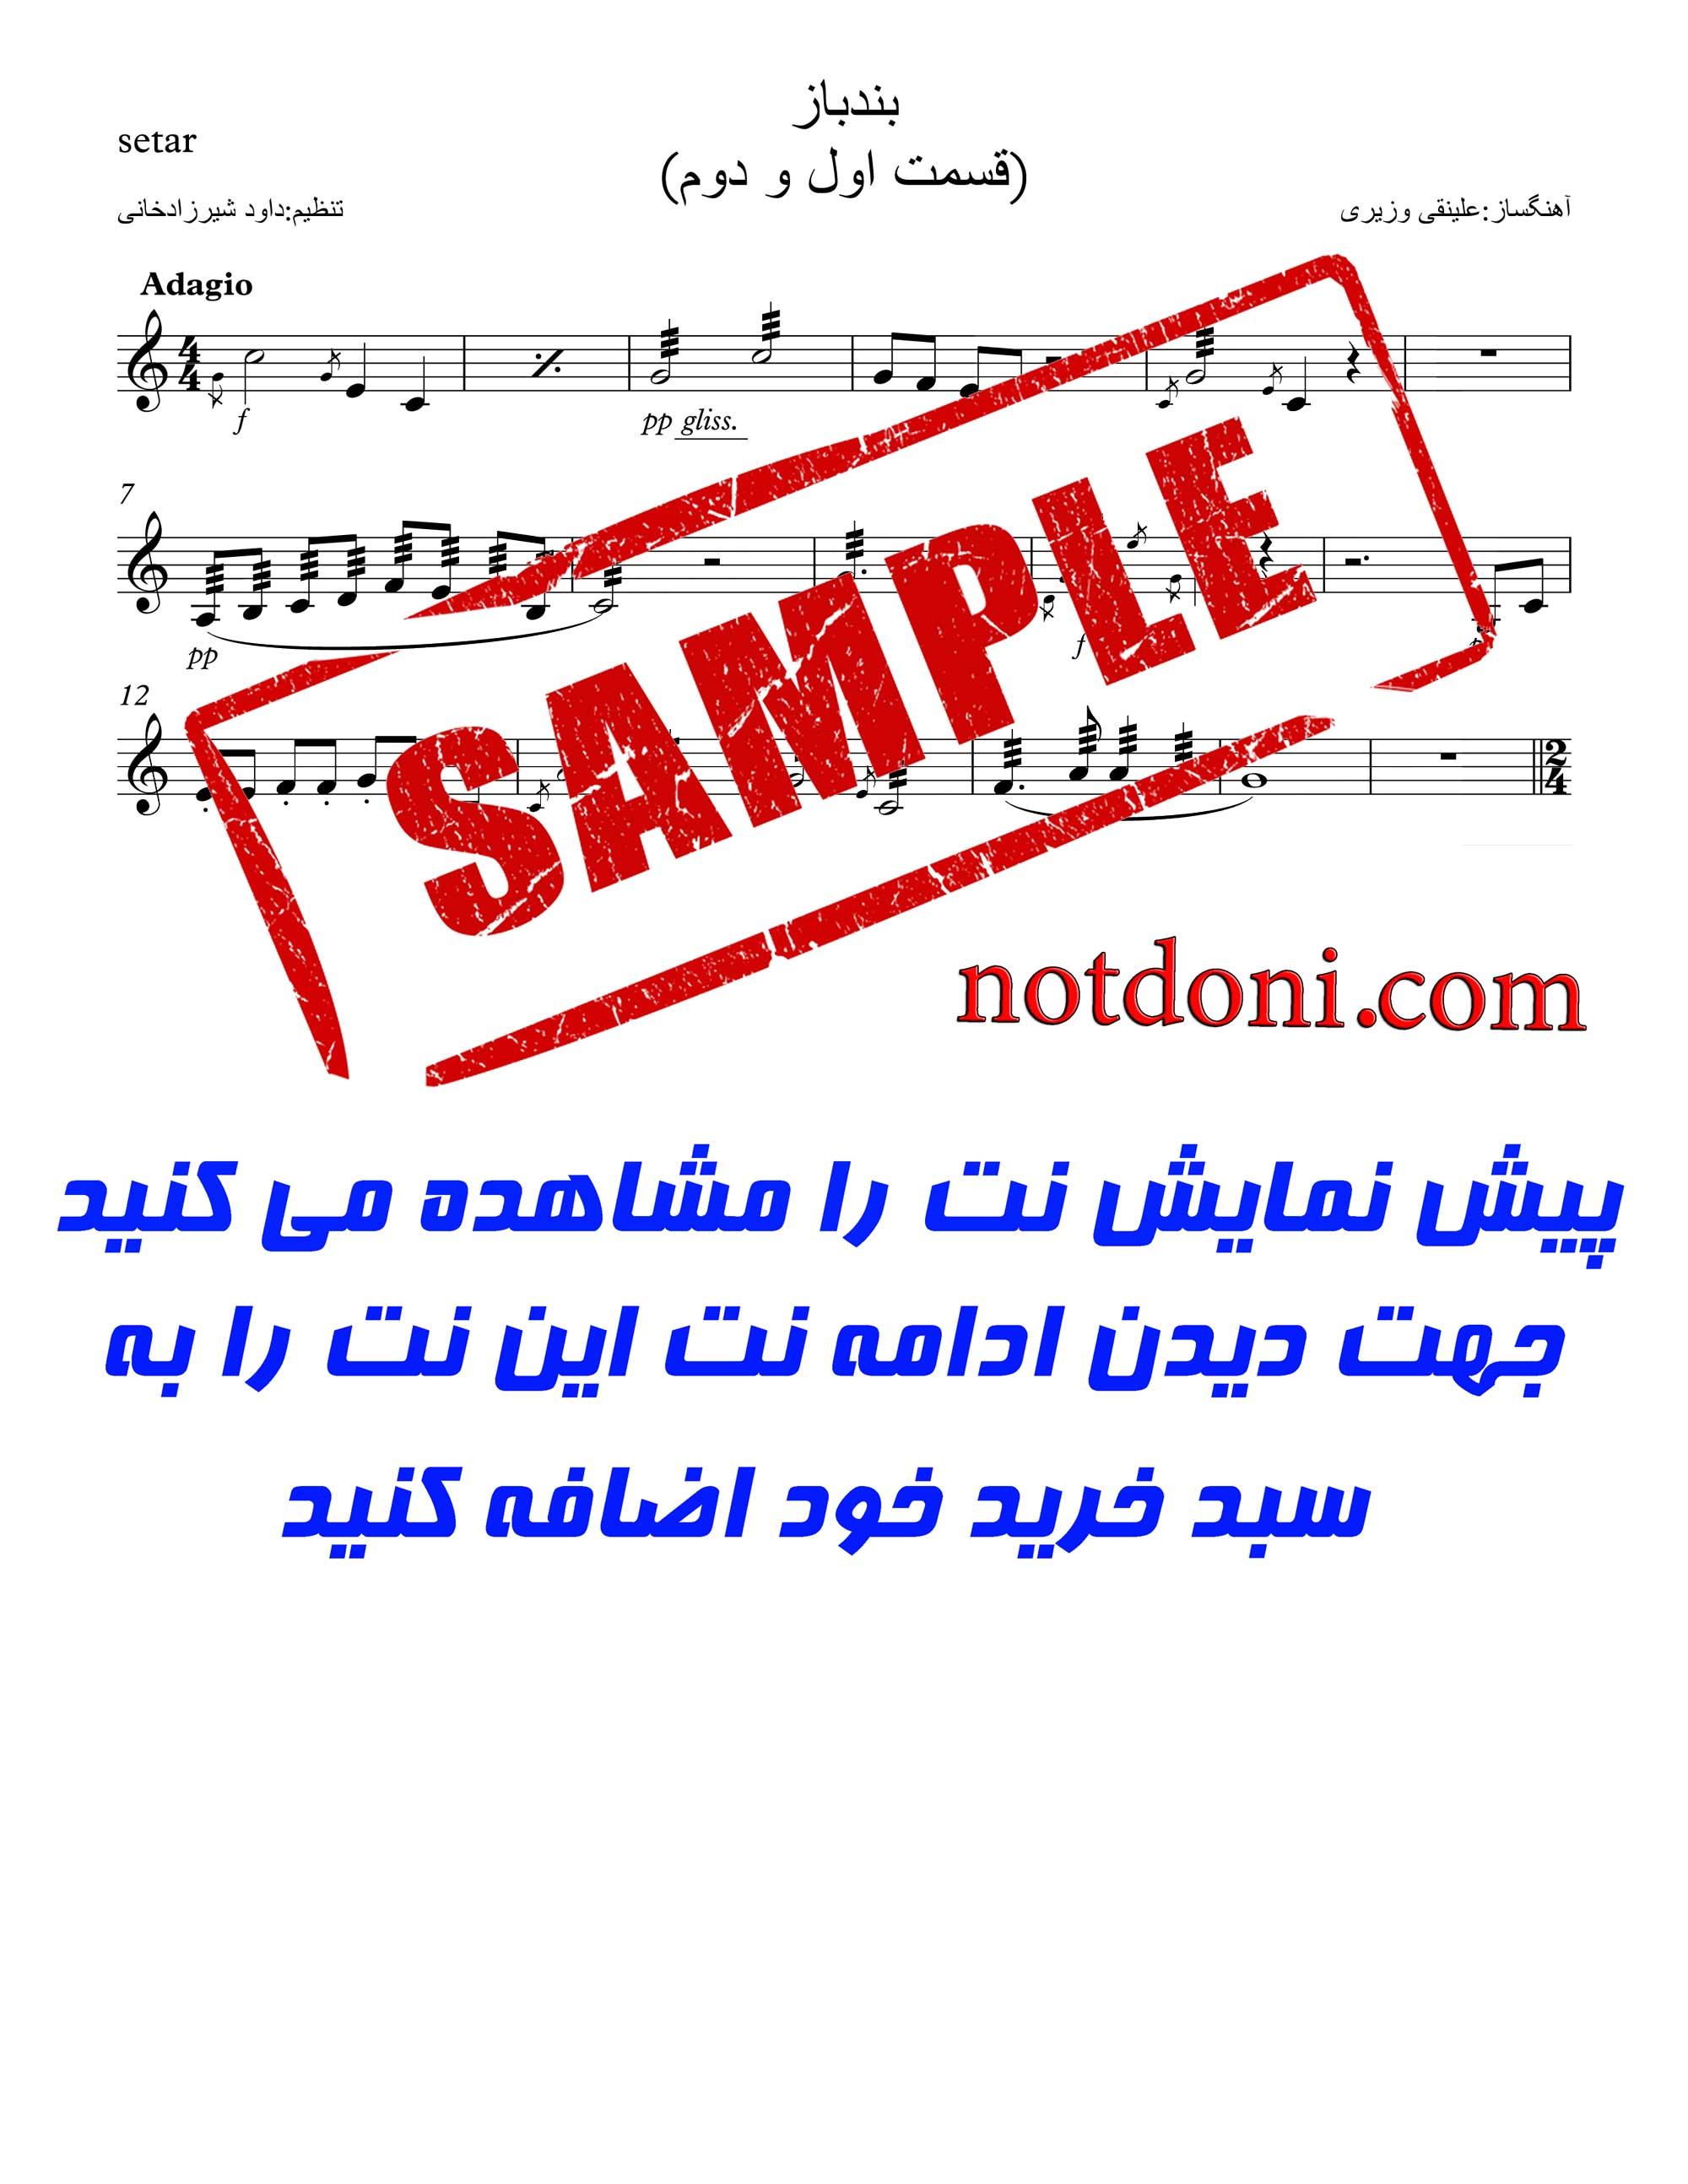 a9186b1e-0890-42fa-8b1d-3e644bd3d77e_دمو4.jpg